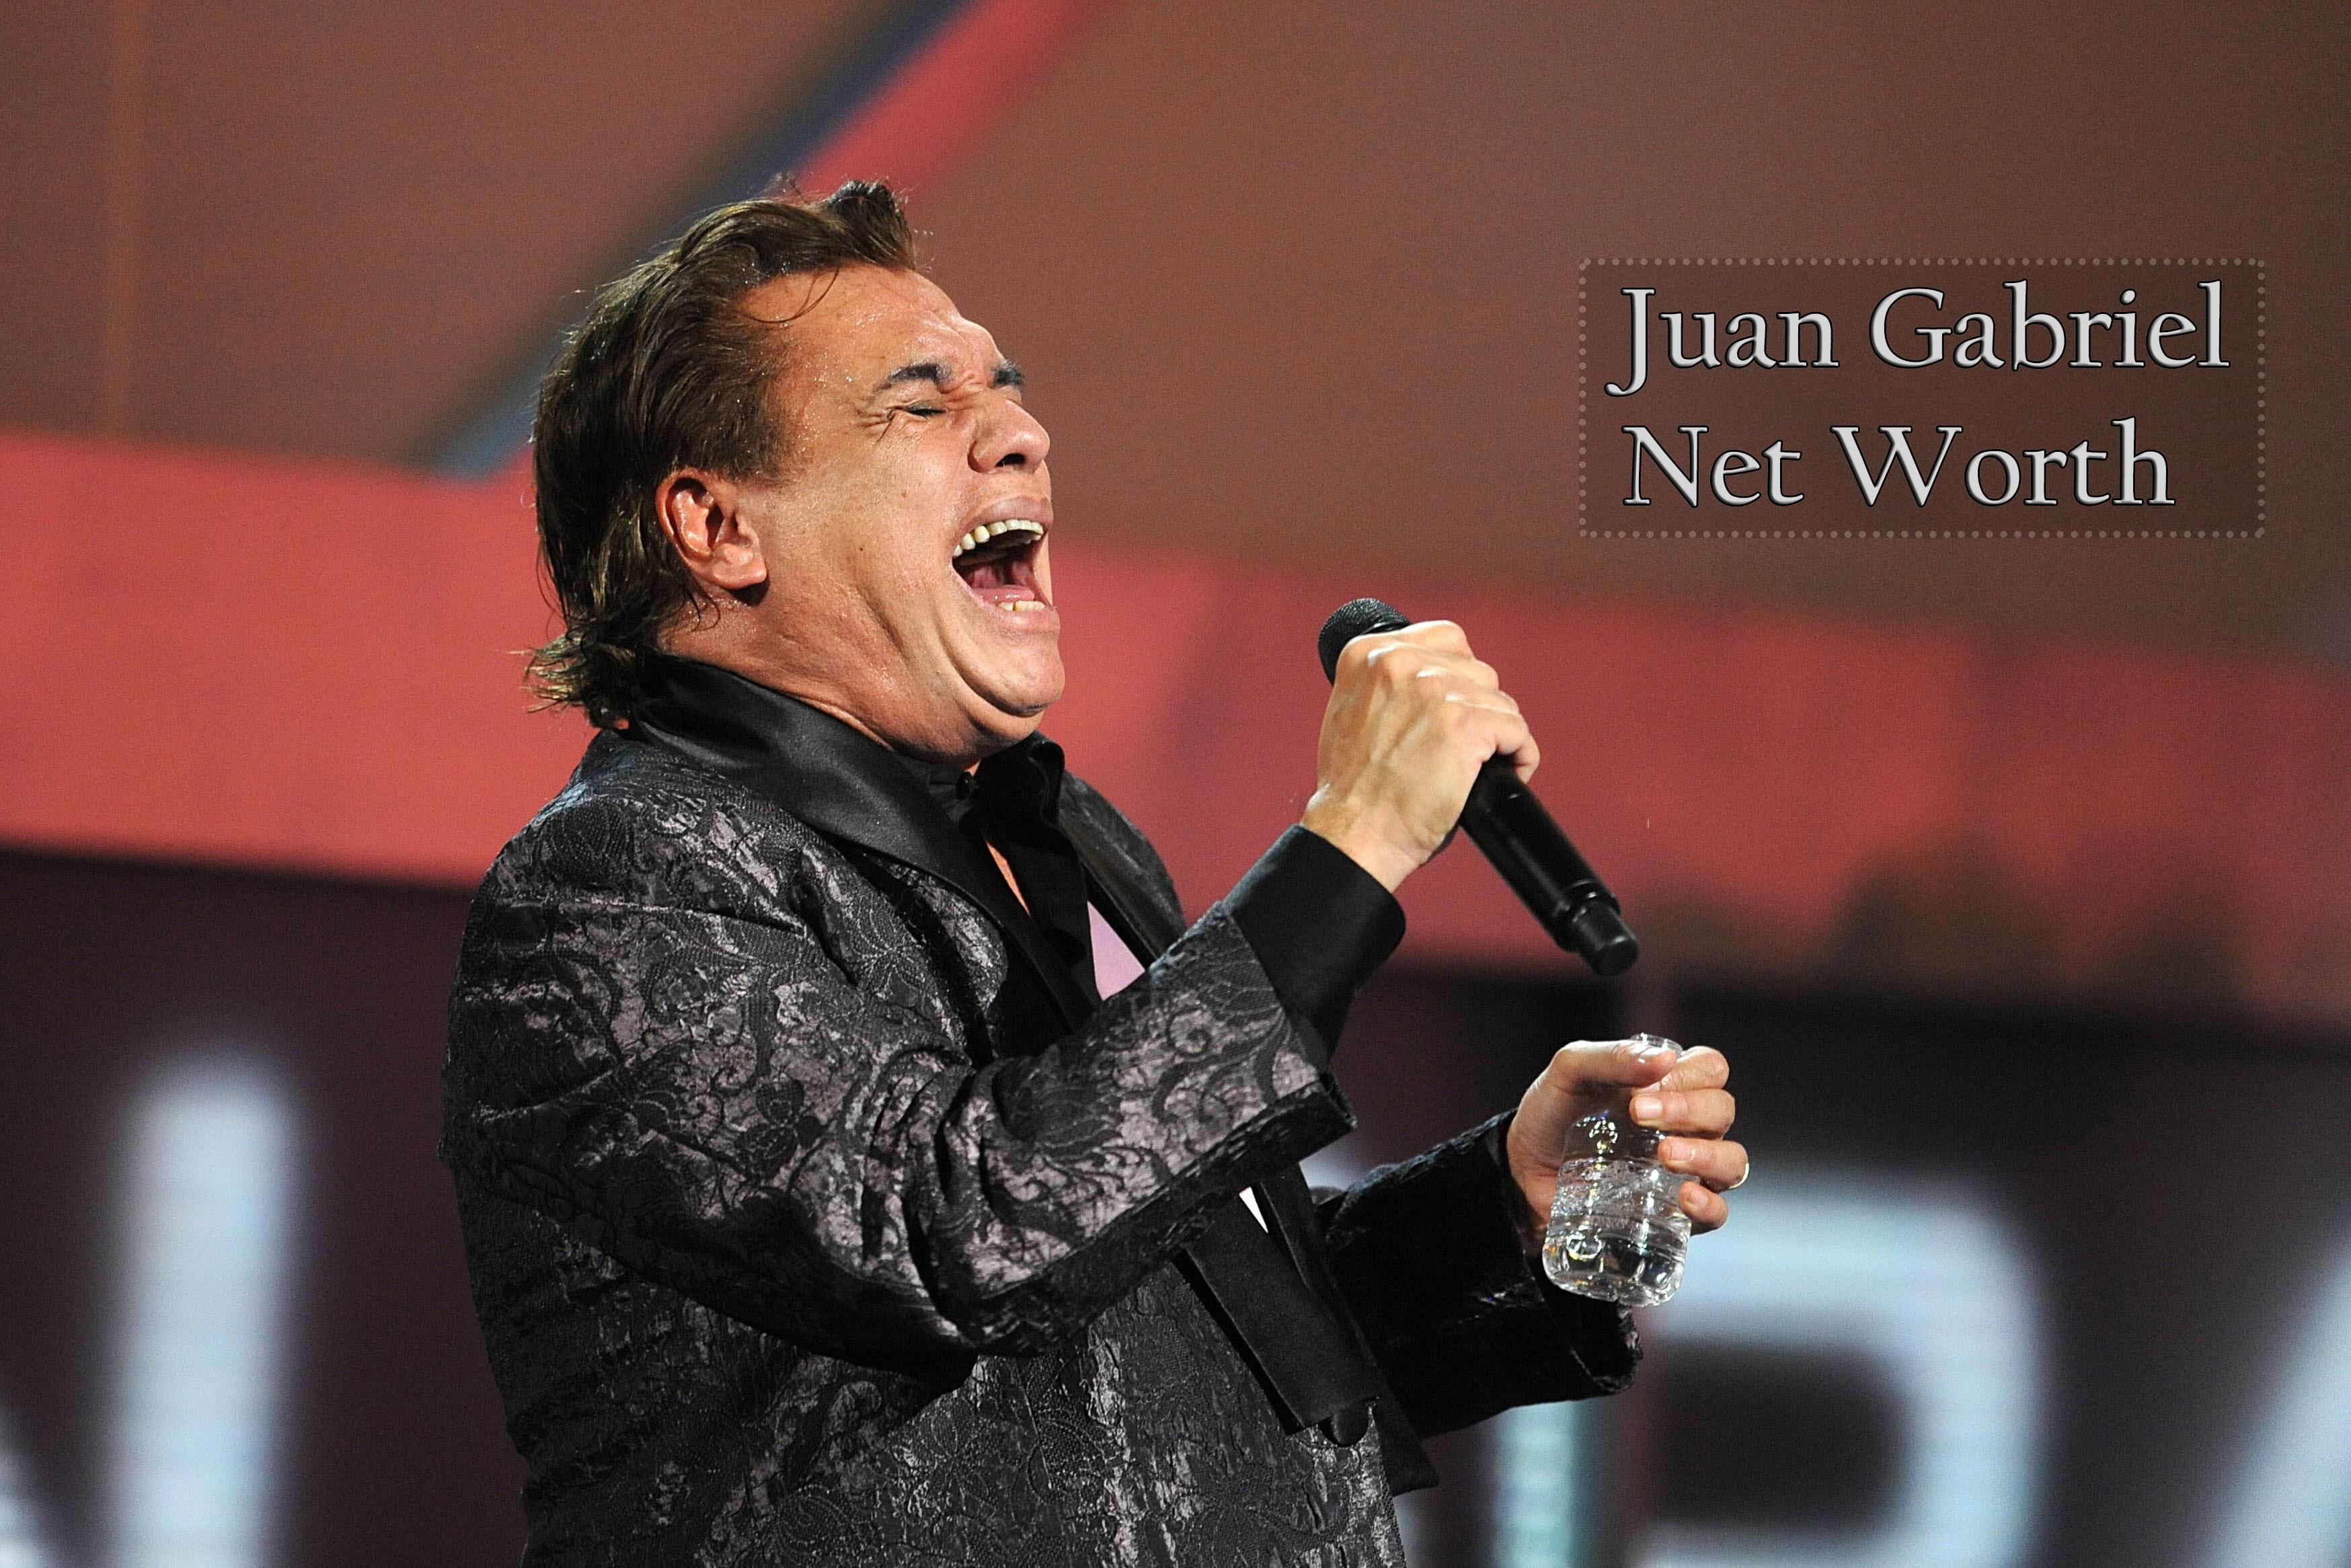 Juan Gabriel Net Worth